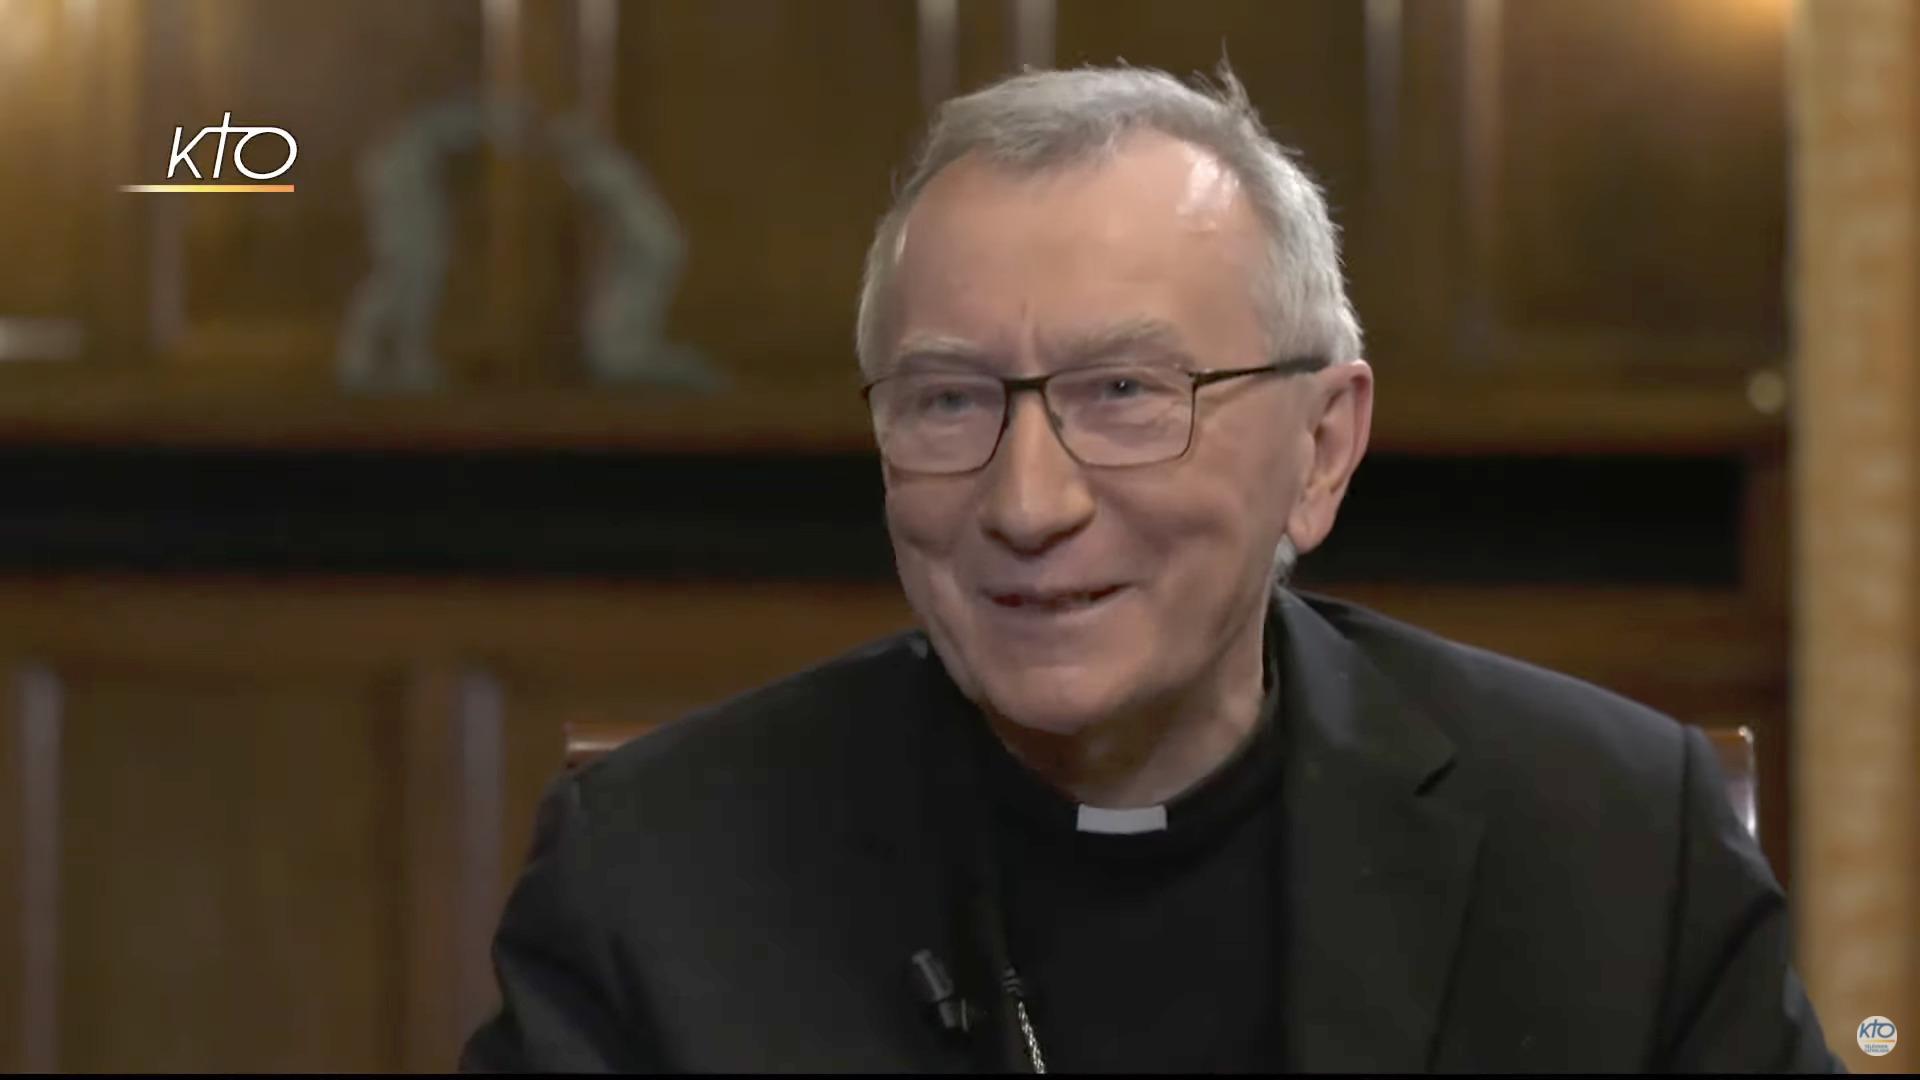 Cardinal Parolin, capture @KTO, 29 janvier 2021